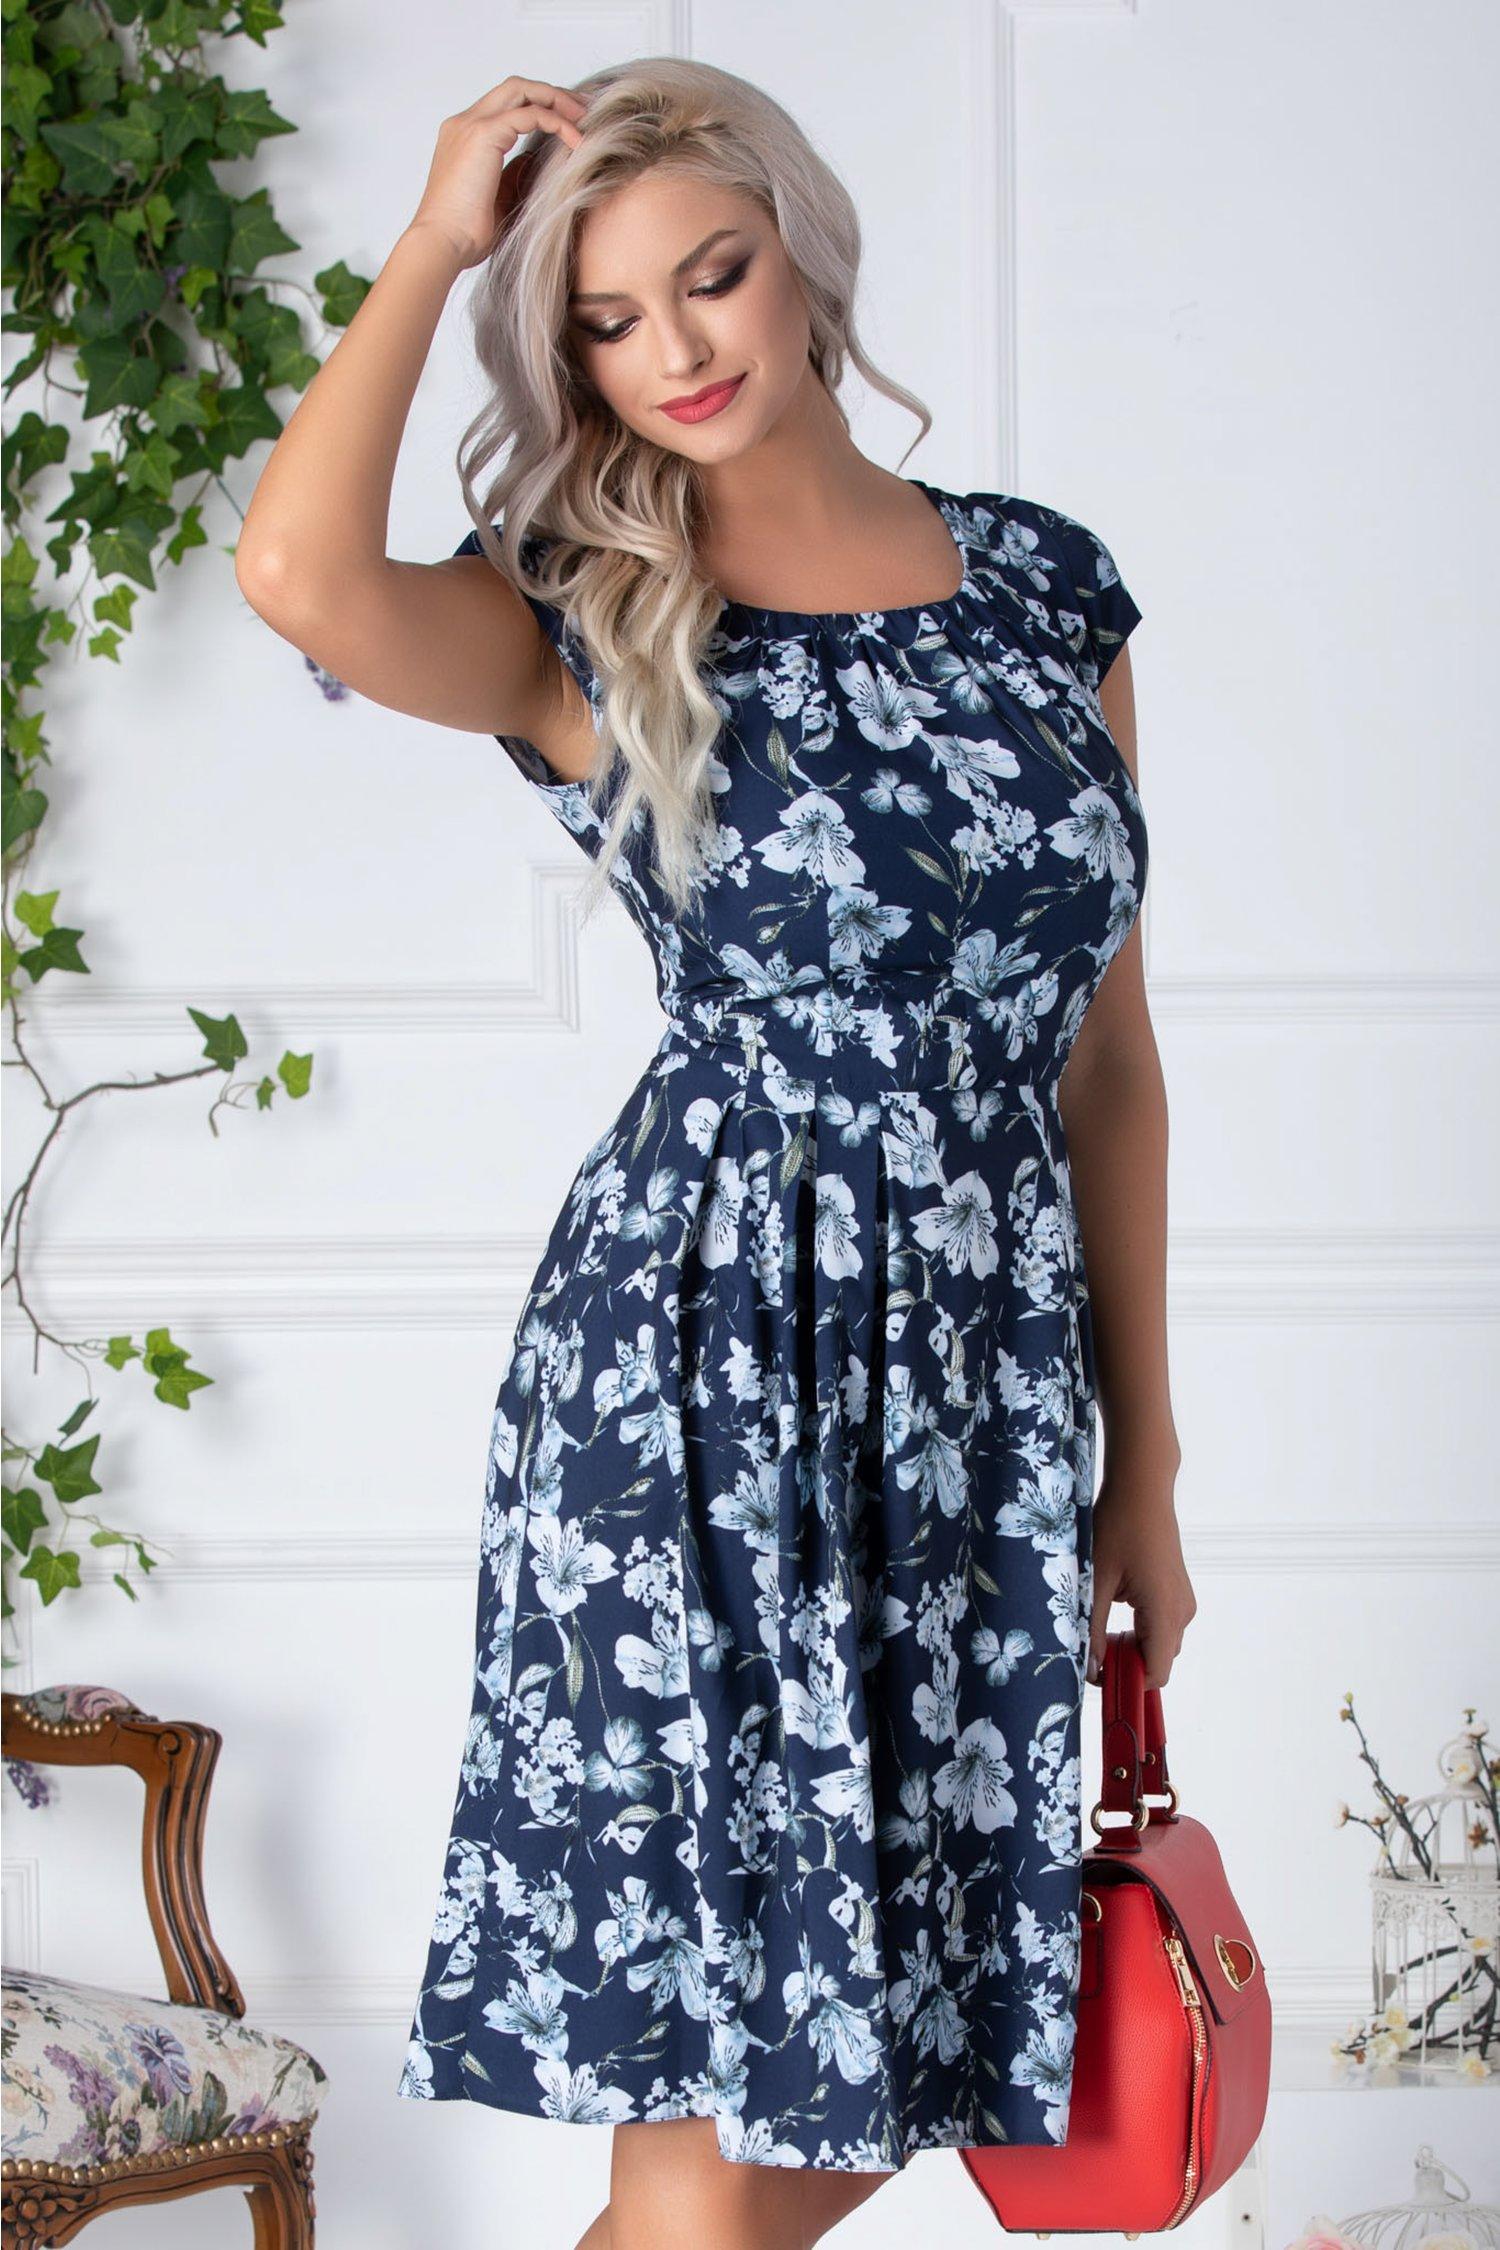 Rochie Denise clos bleumarin cu imprimeu floral bleu